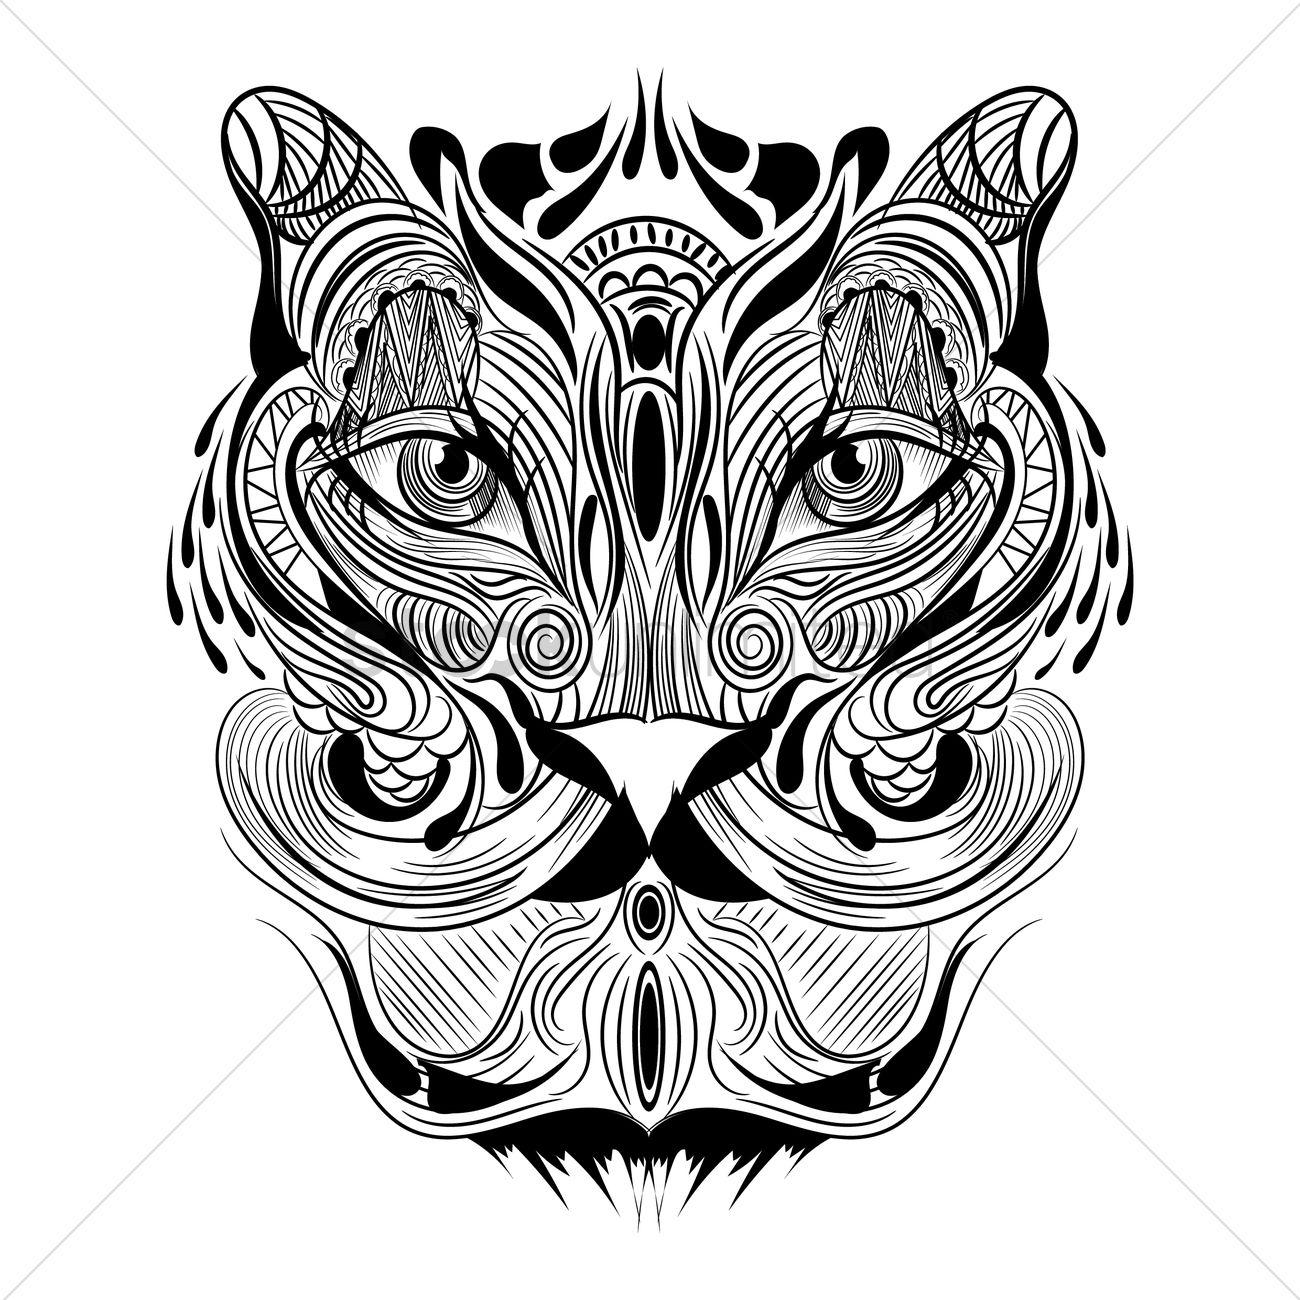 Tiger Monochrome Design Vector Image 1543980